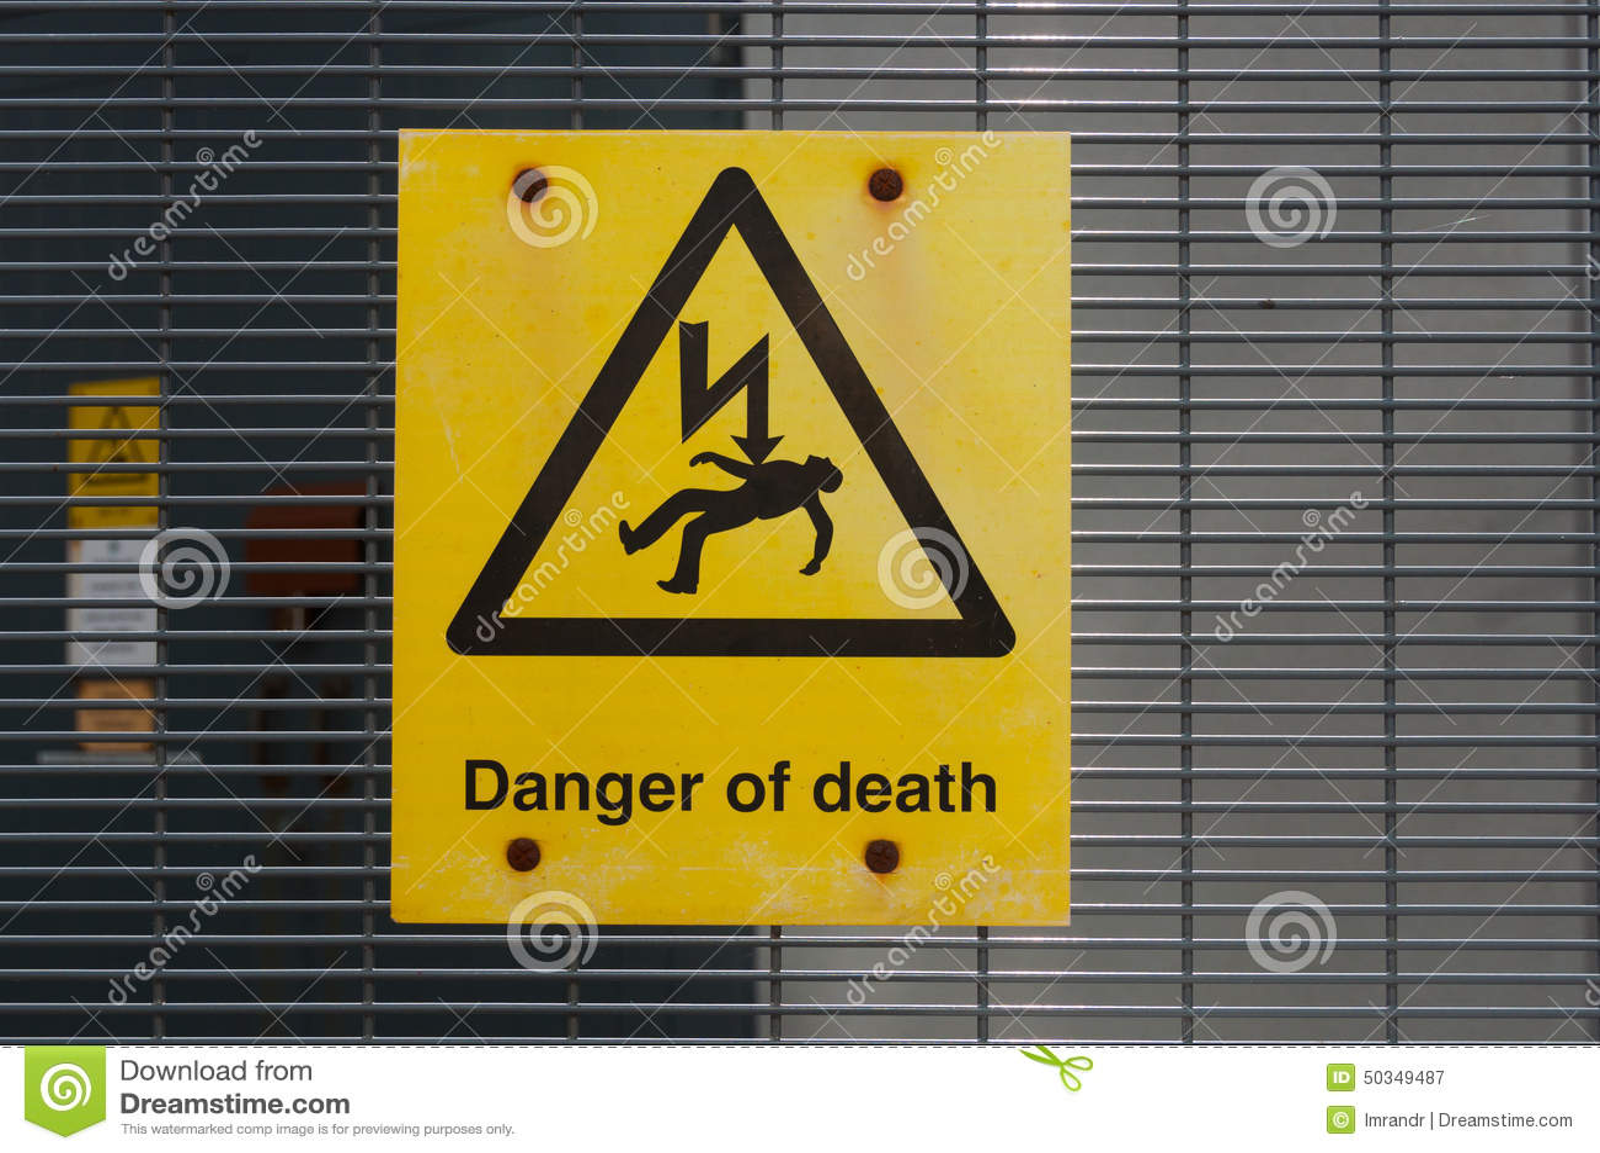 Danger High Voltage Risk Of Death Sign Stock Image - Image of notice